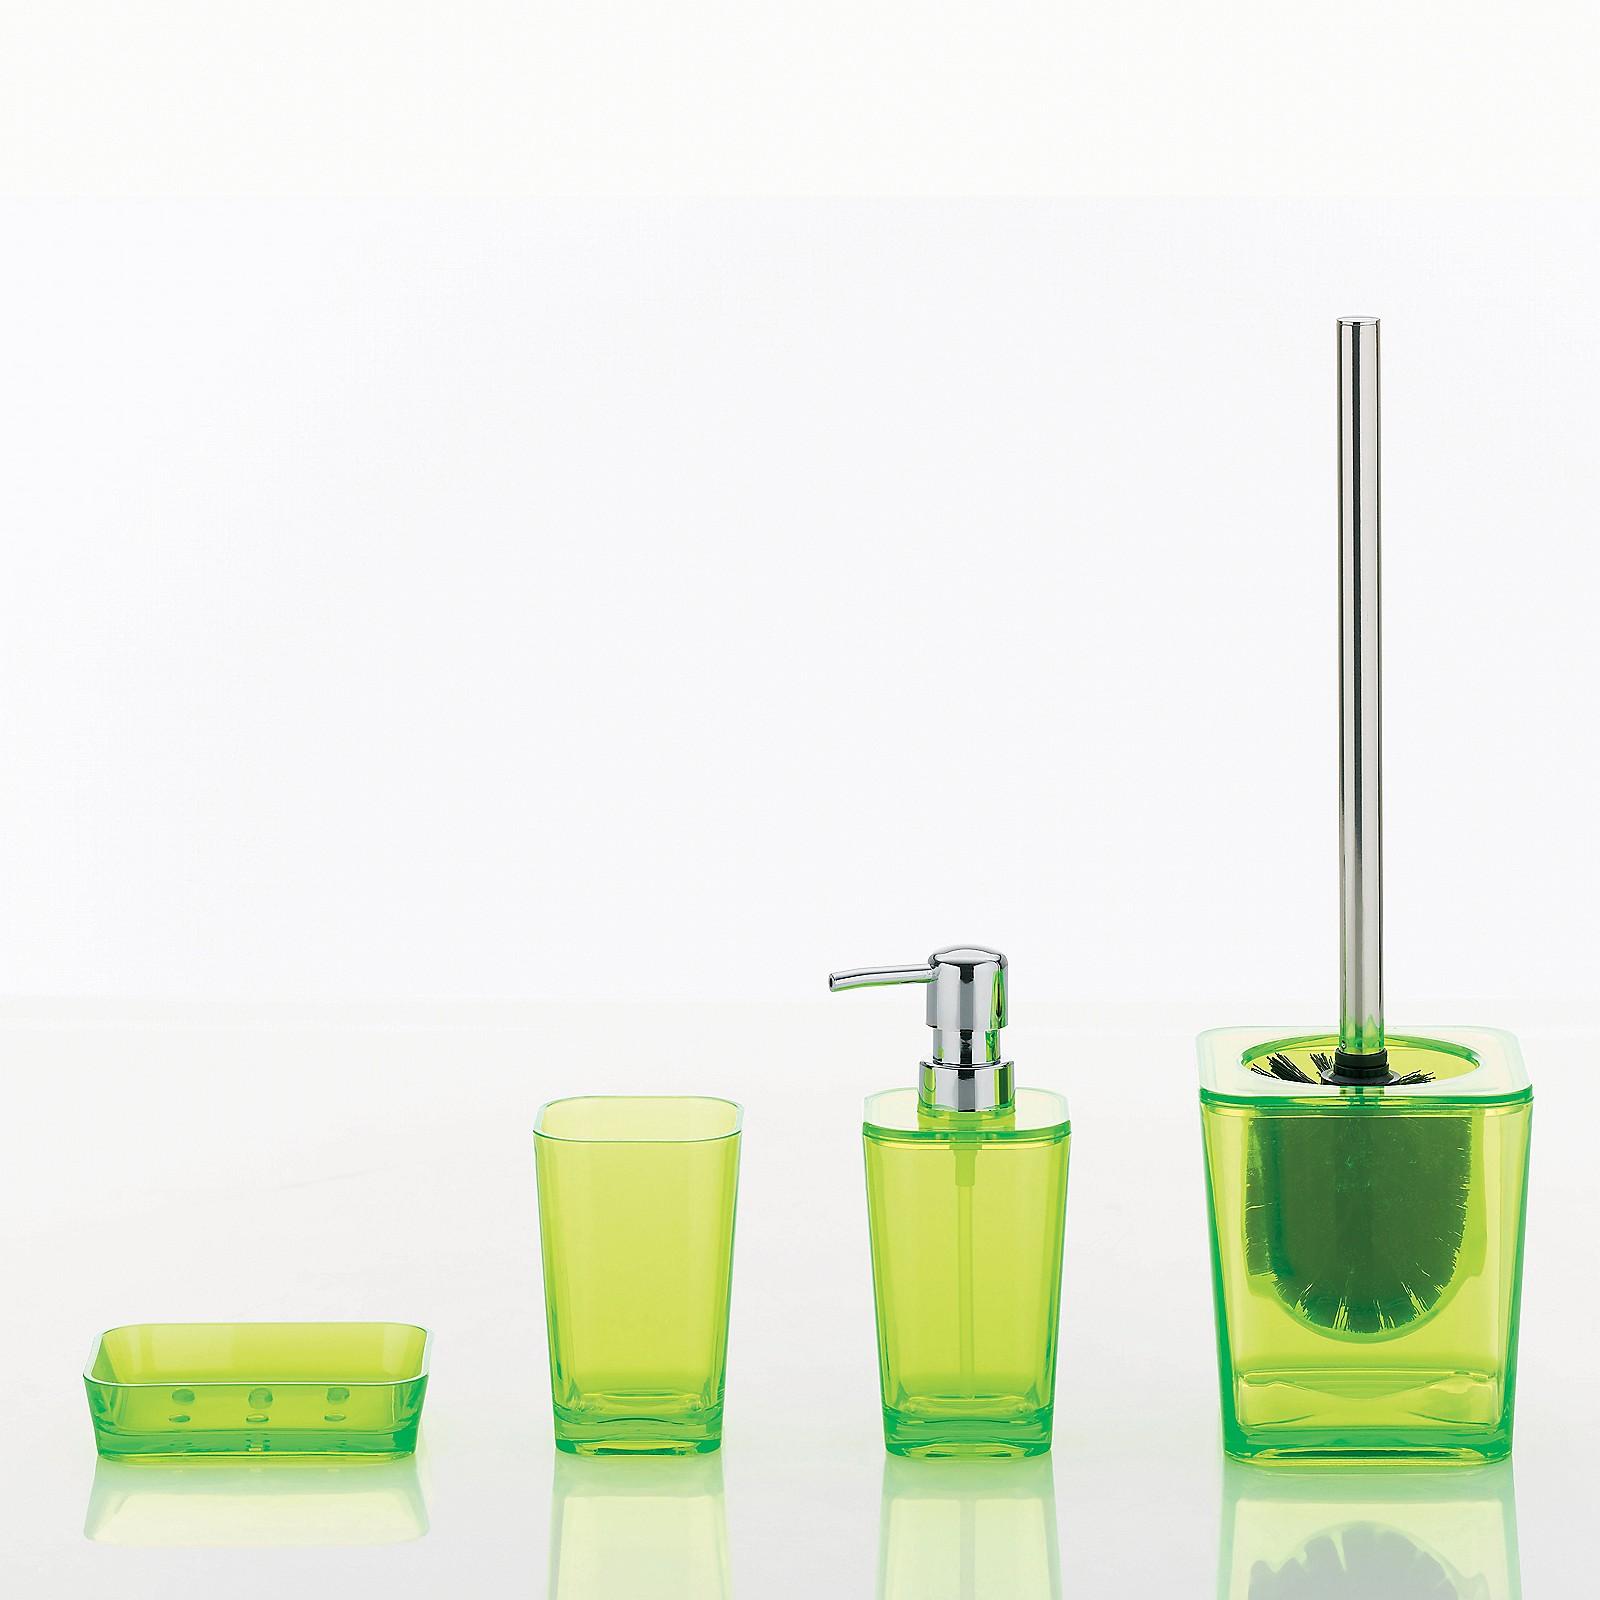 Zahnputzbecher Mirage Kela Metal grün Glas